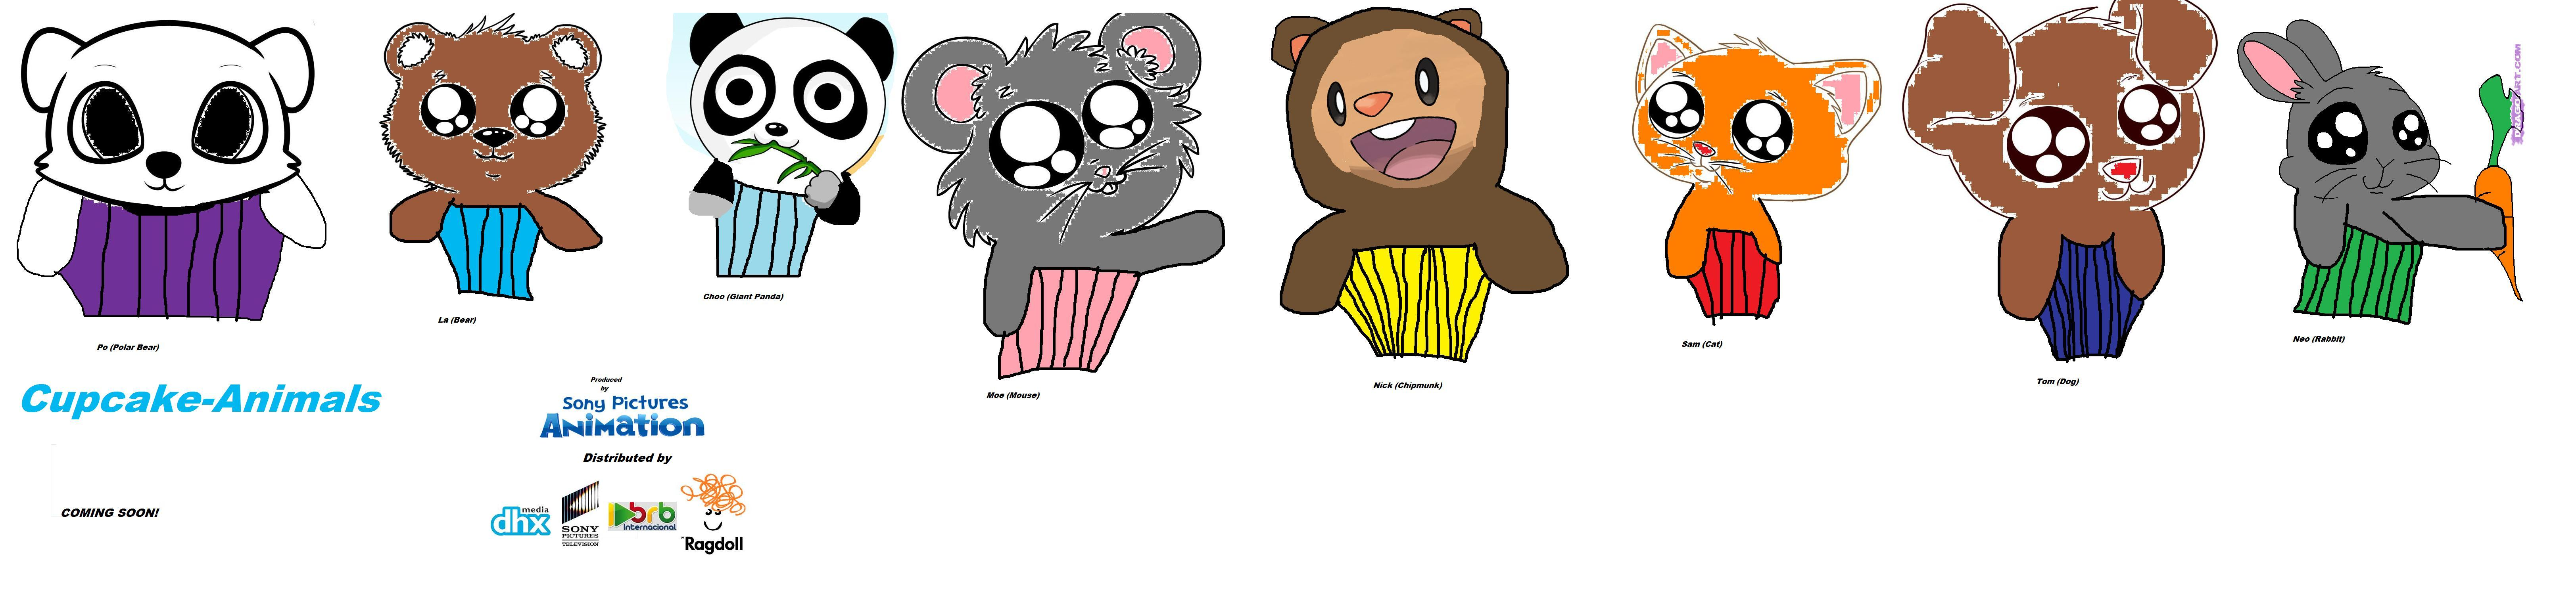 Cupcake Animals (TV)